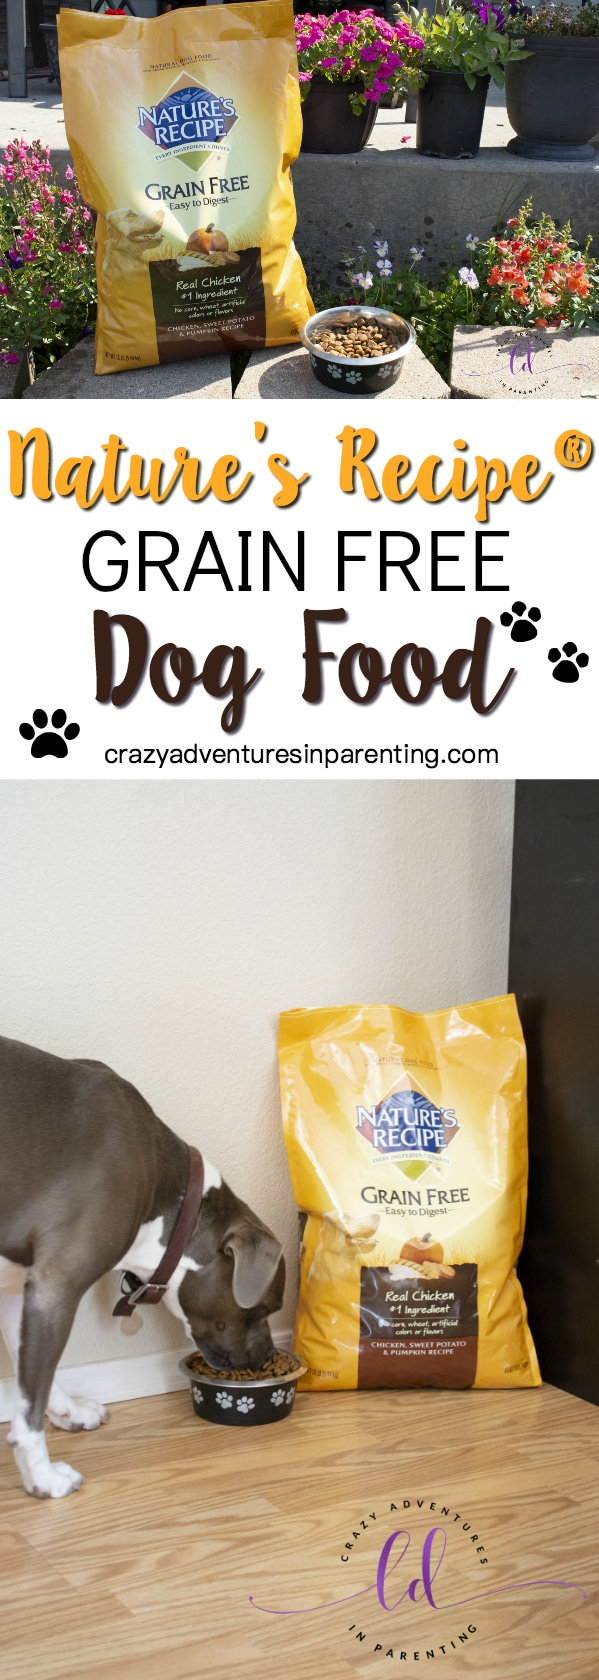 Nature's Recipe Grain Free Dog Food